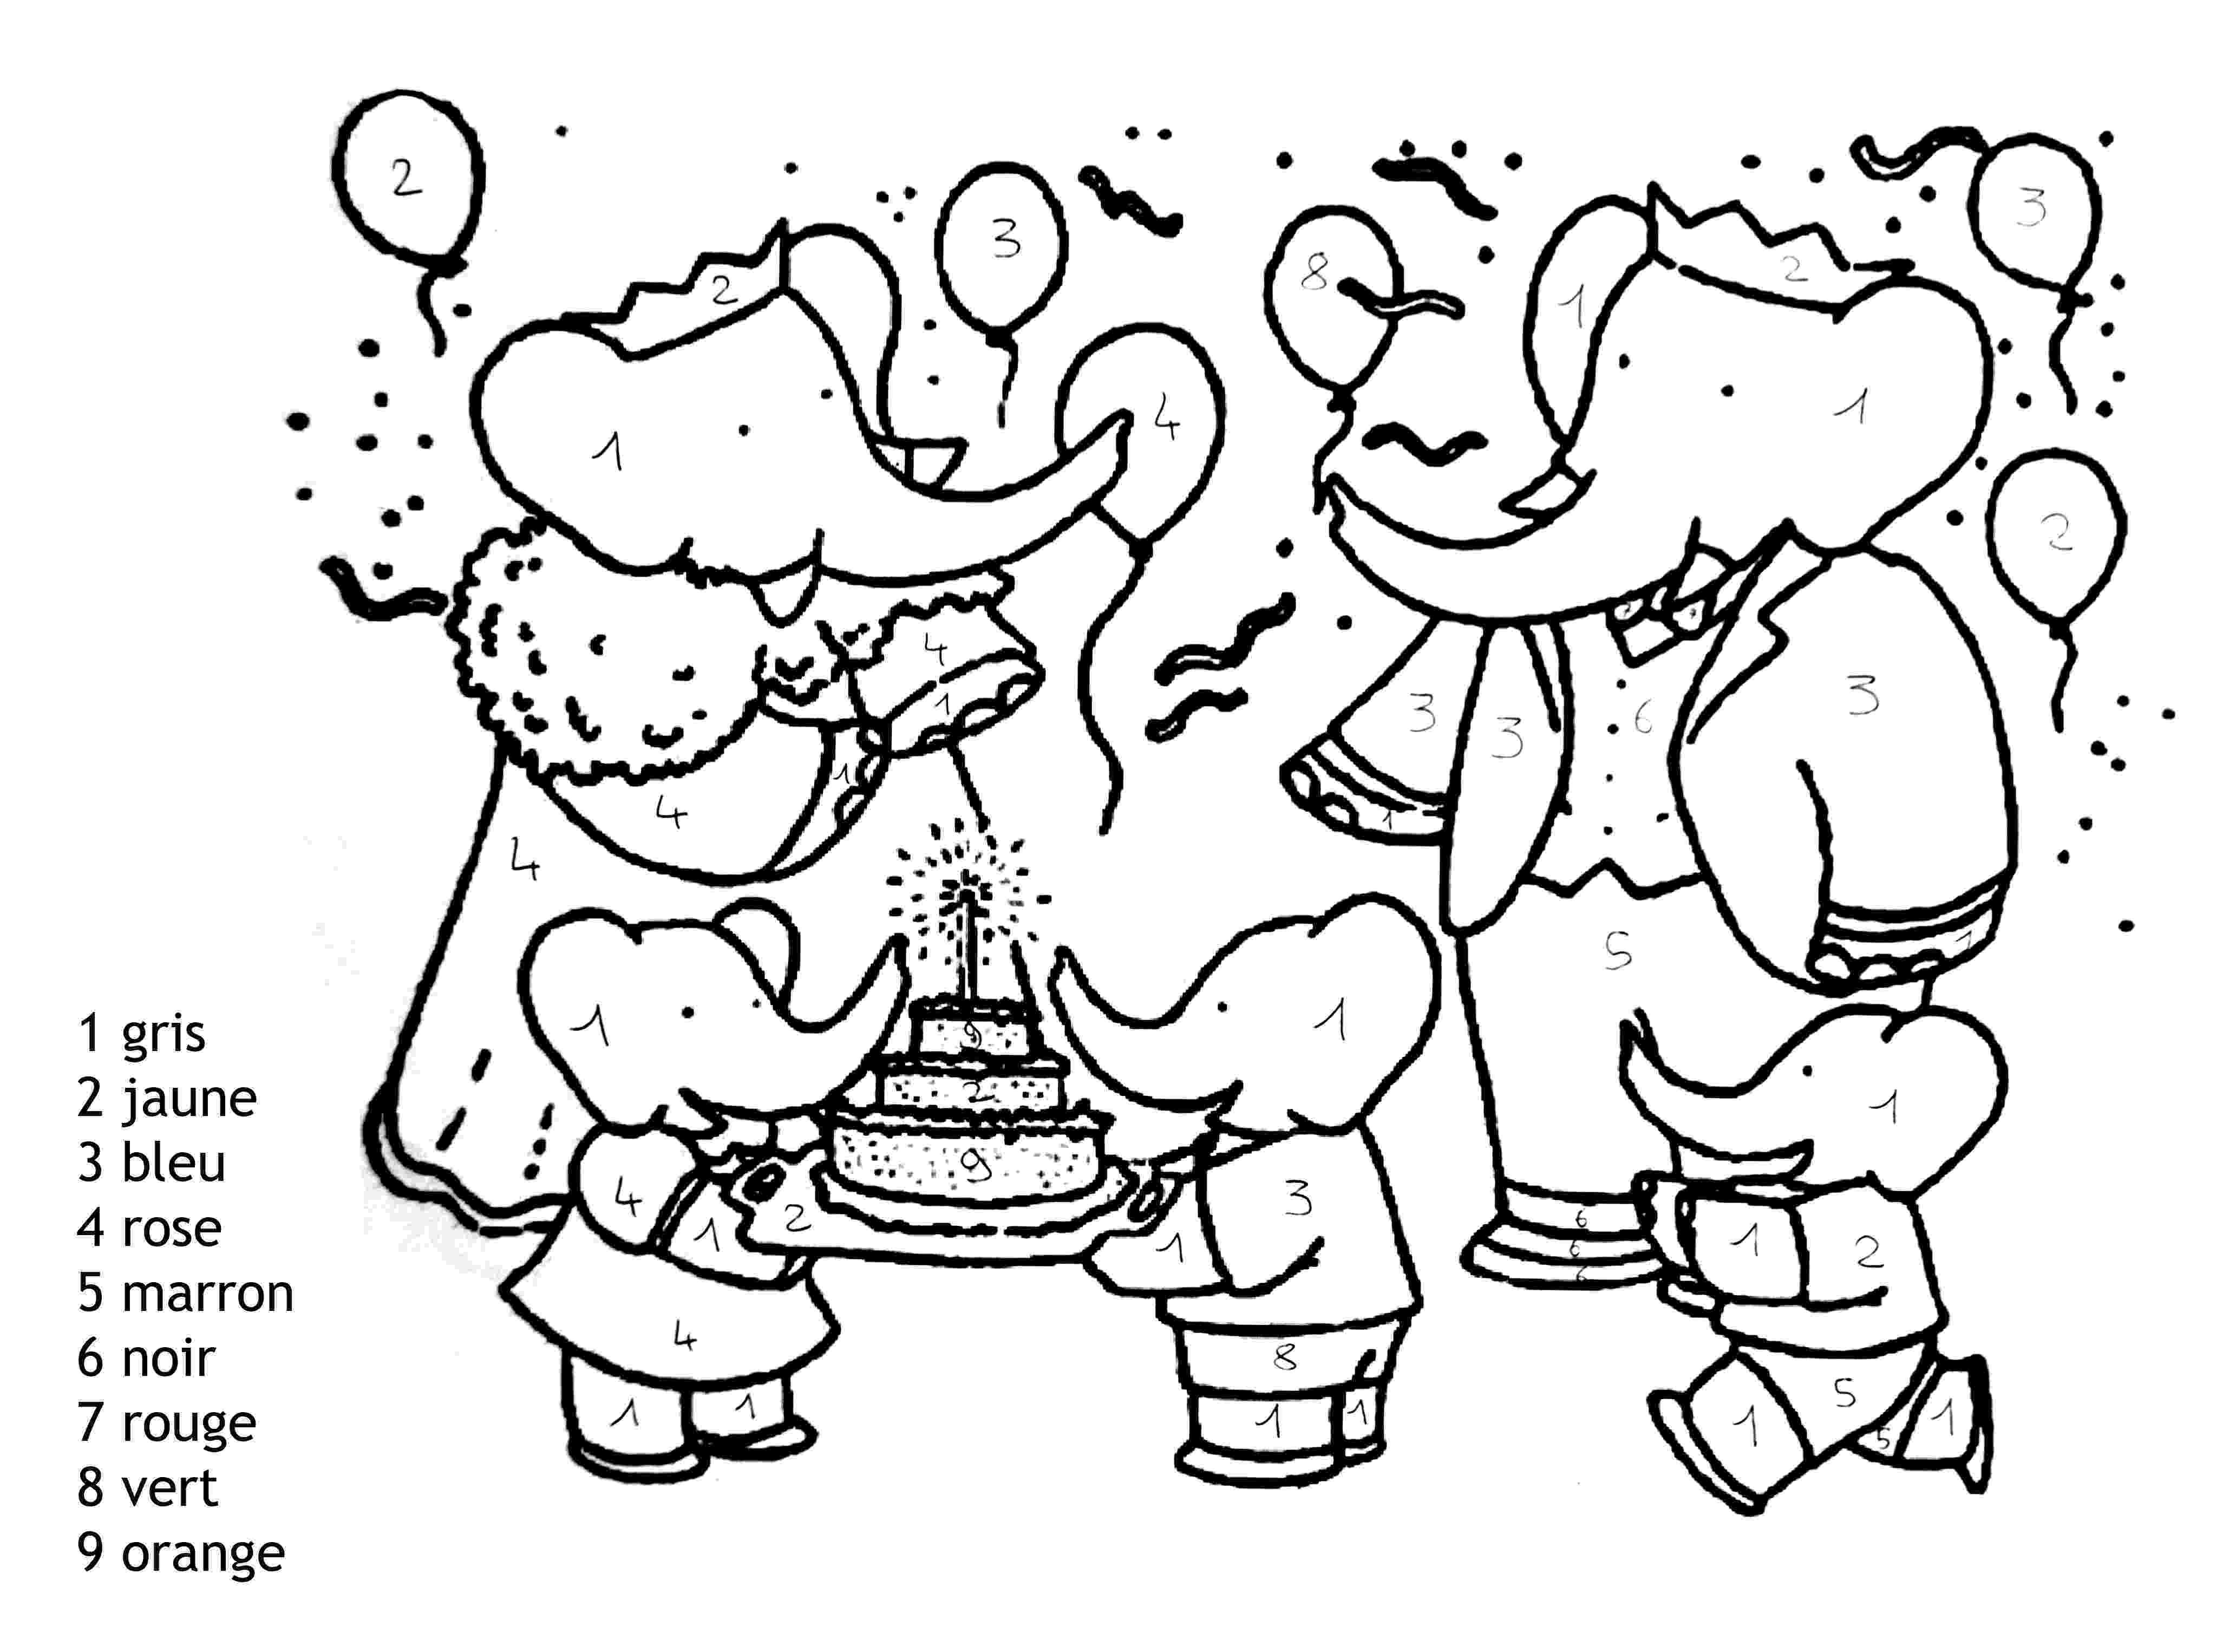 magic coloring sheets bunny in a magic hat coloring page free printable coloring magic sheets